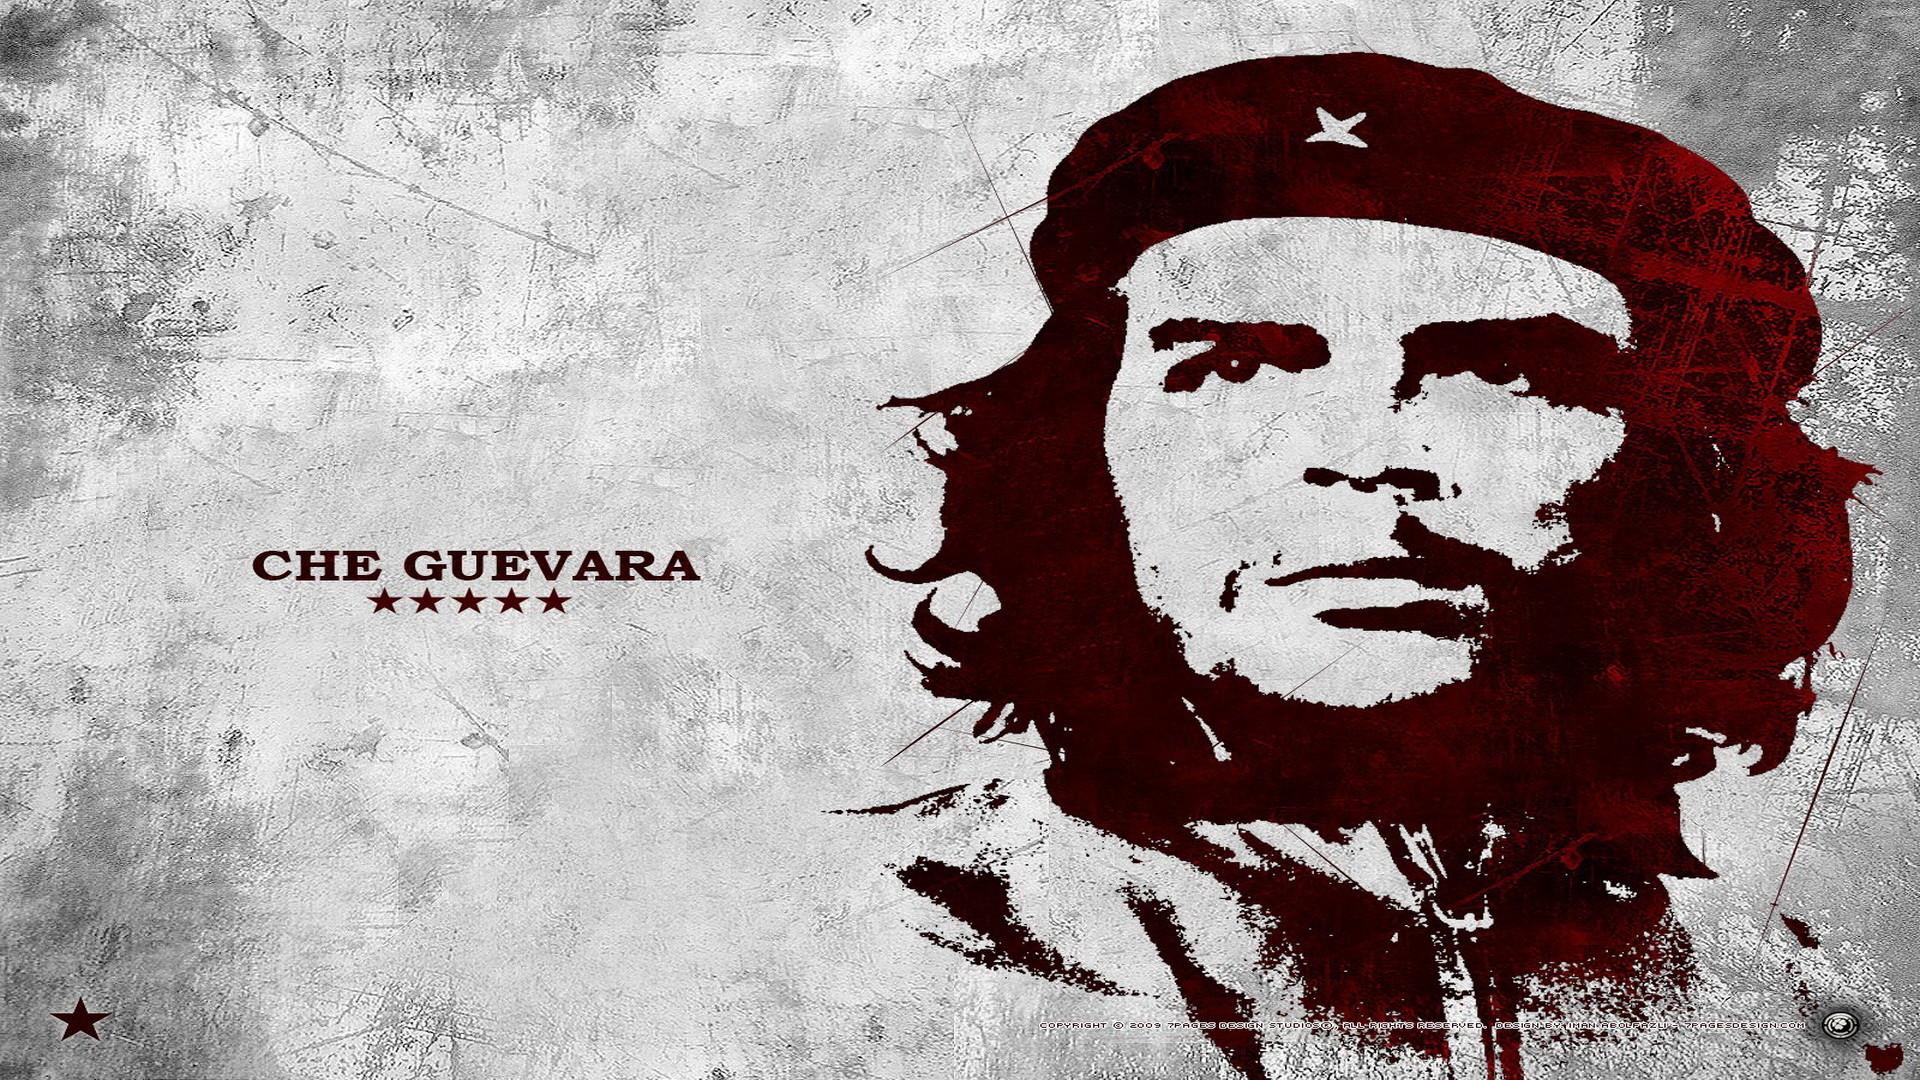 Che Guevara 481374 1920x1200